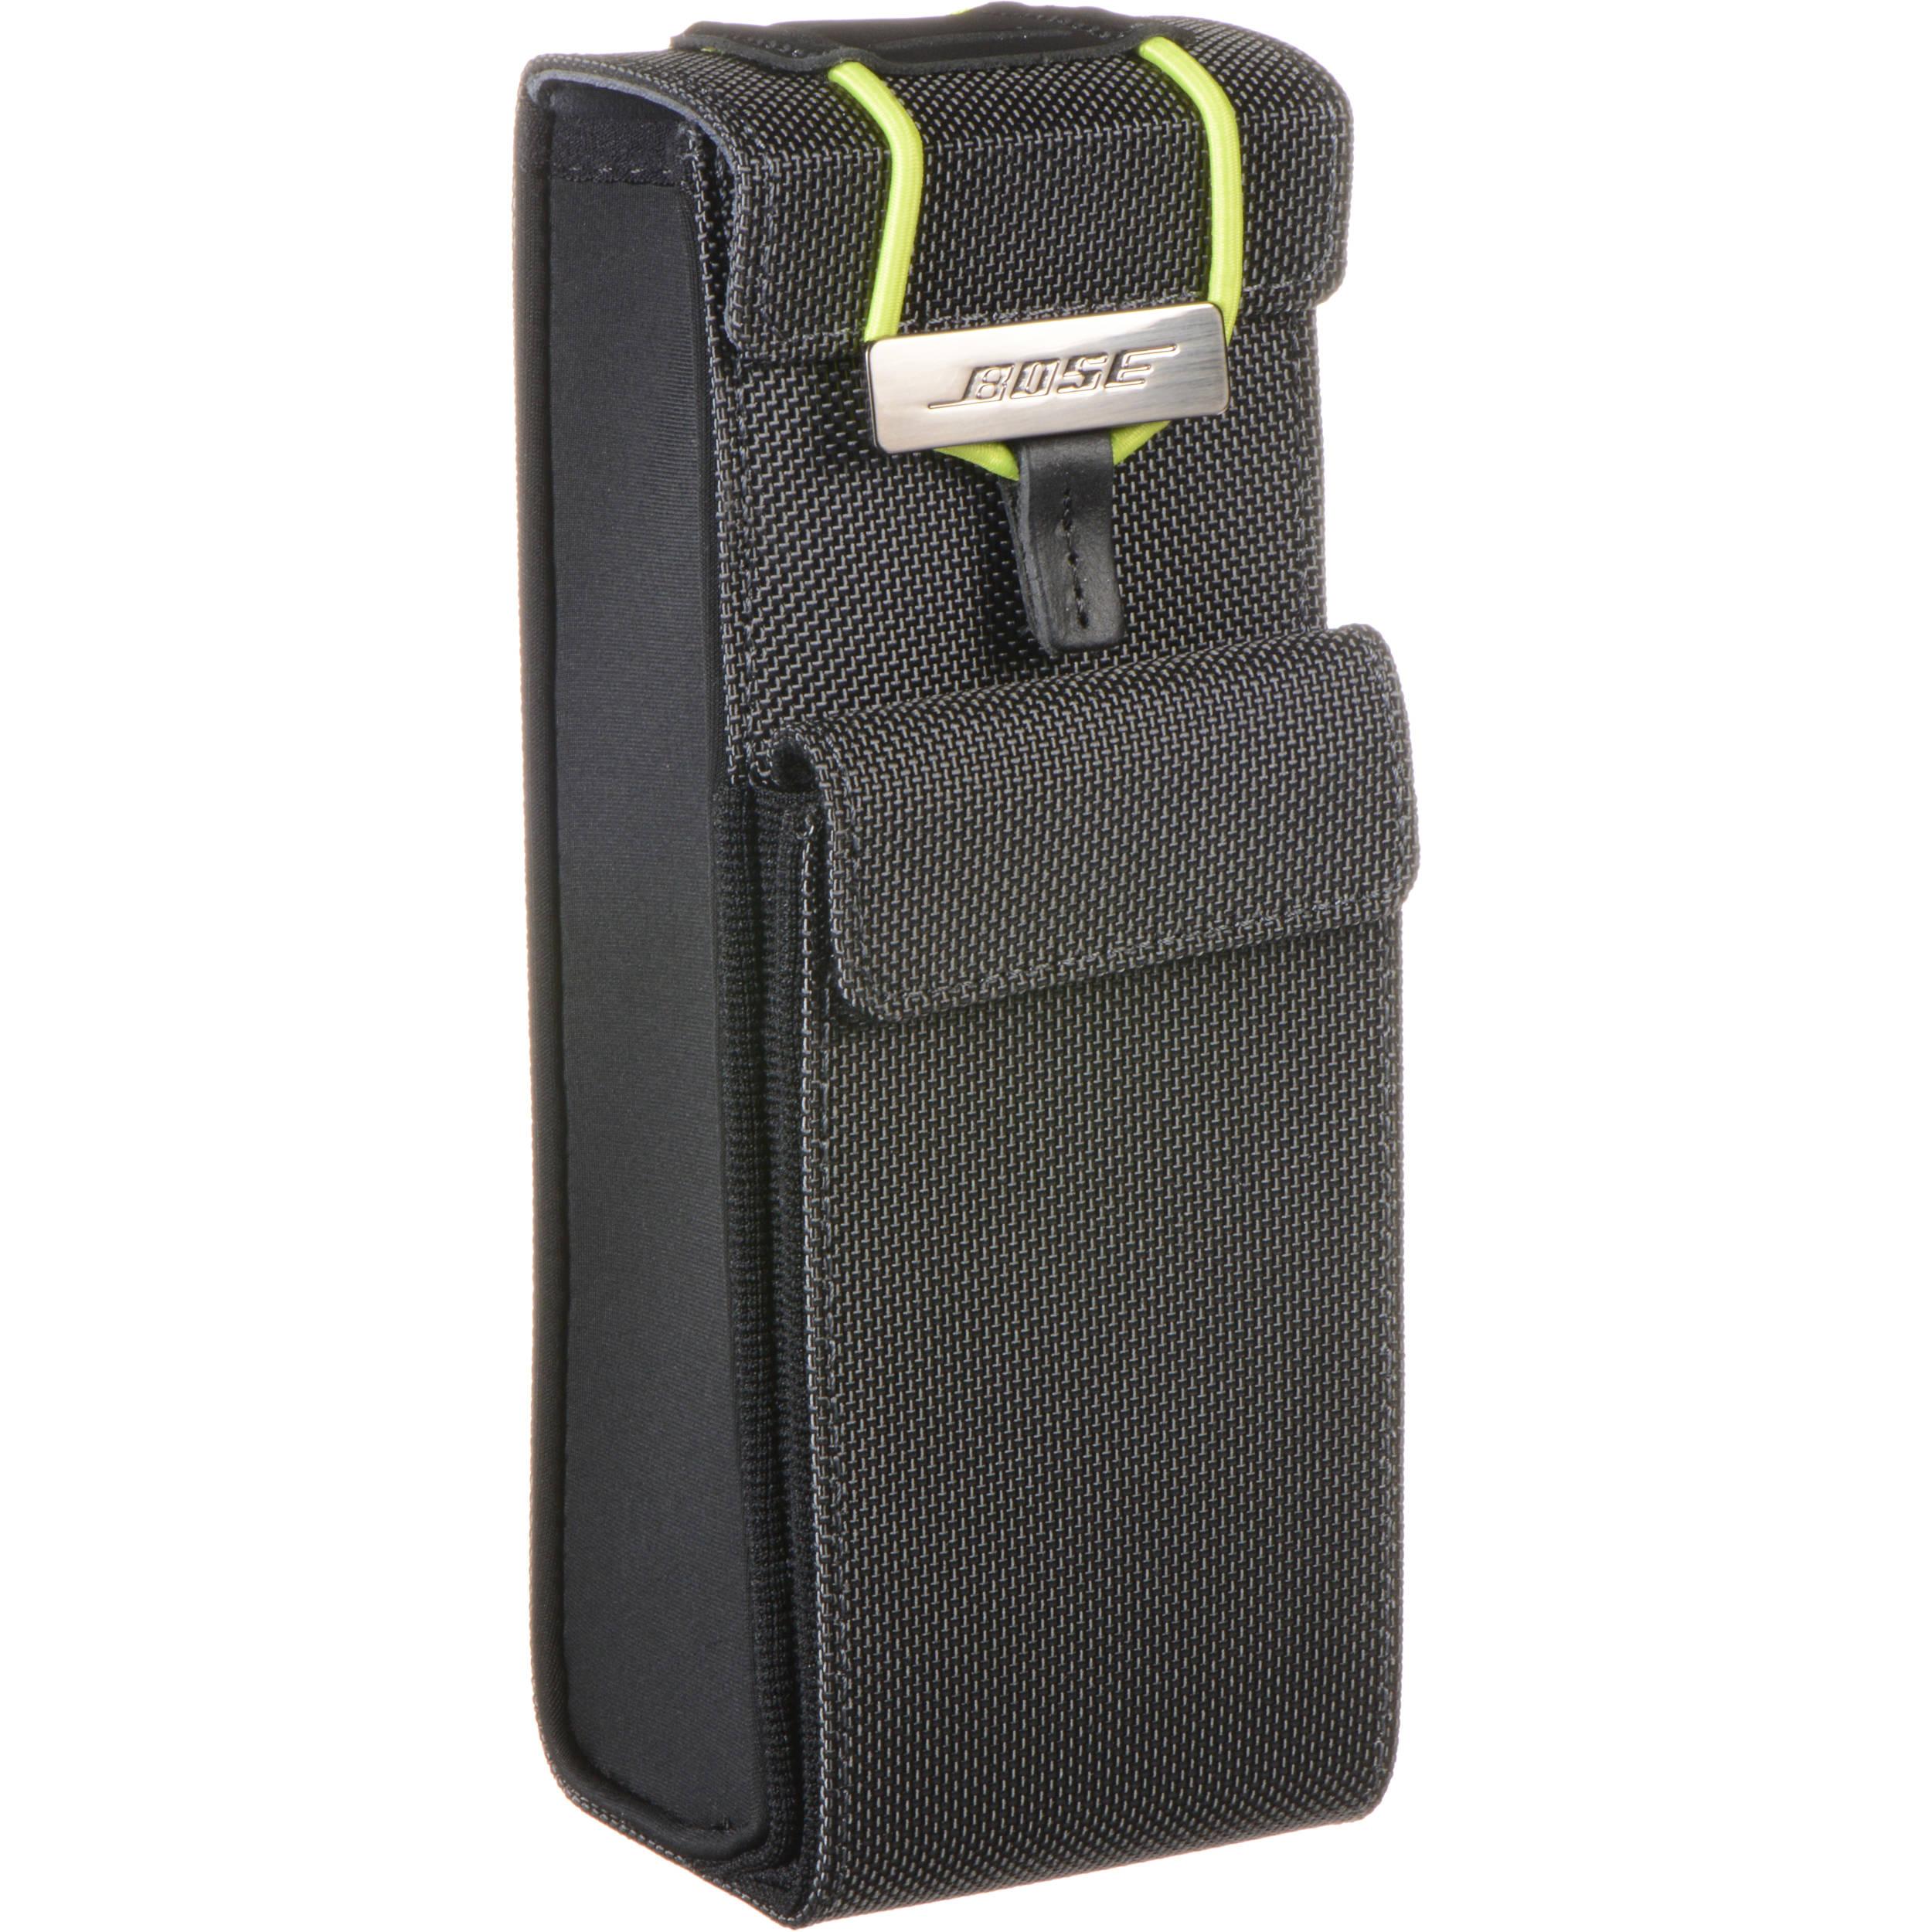 bose mini bluetooth speaker. bose soundlink mini bluetooth speaker travel bag